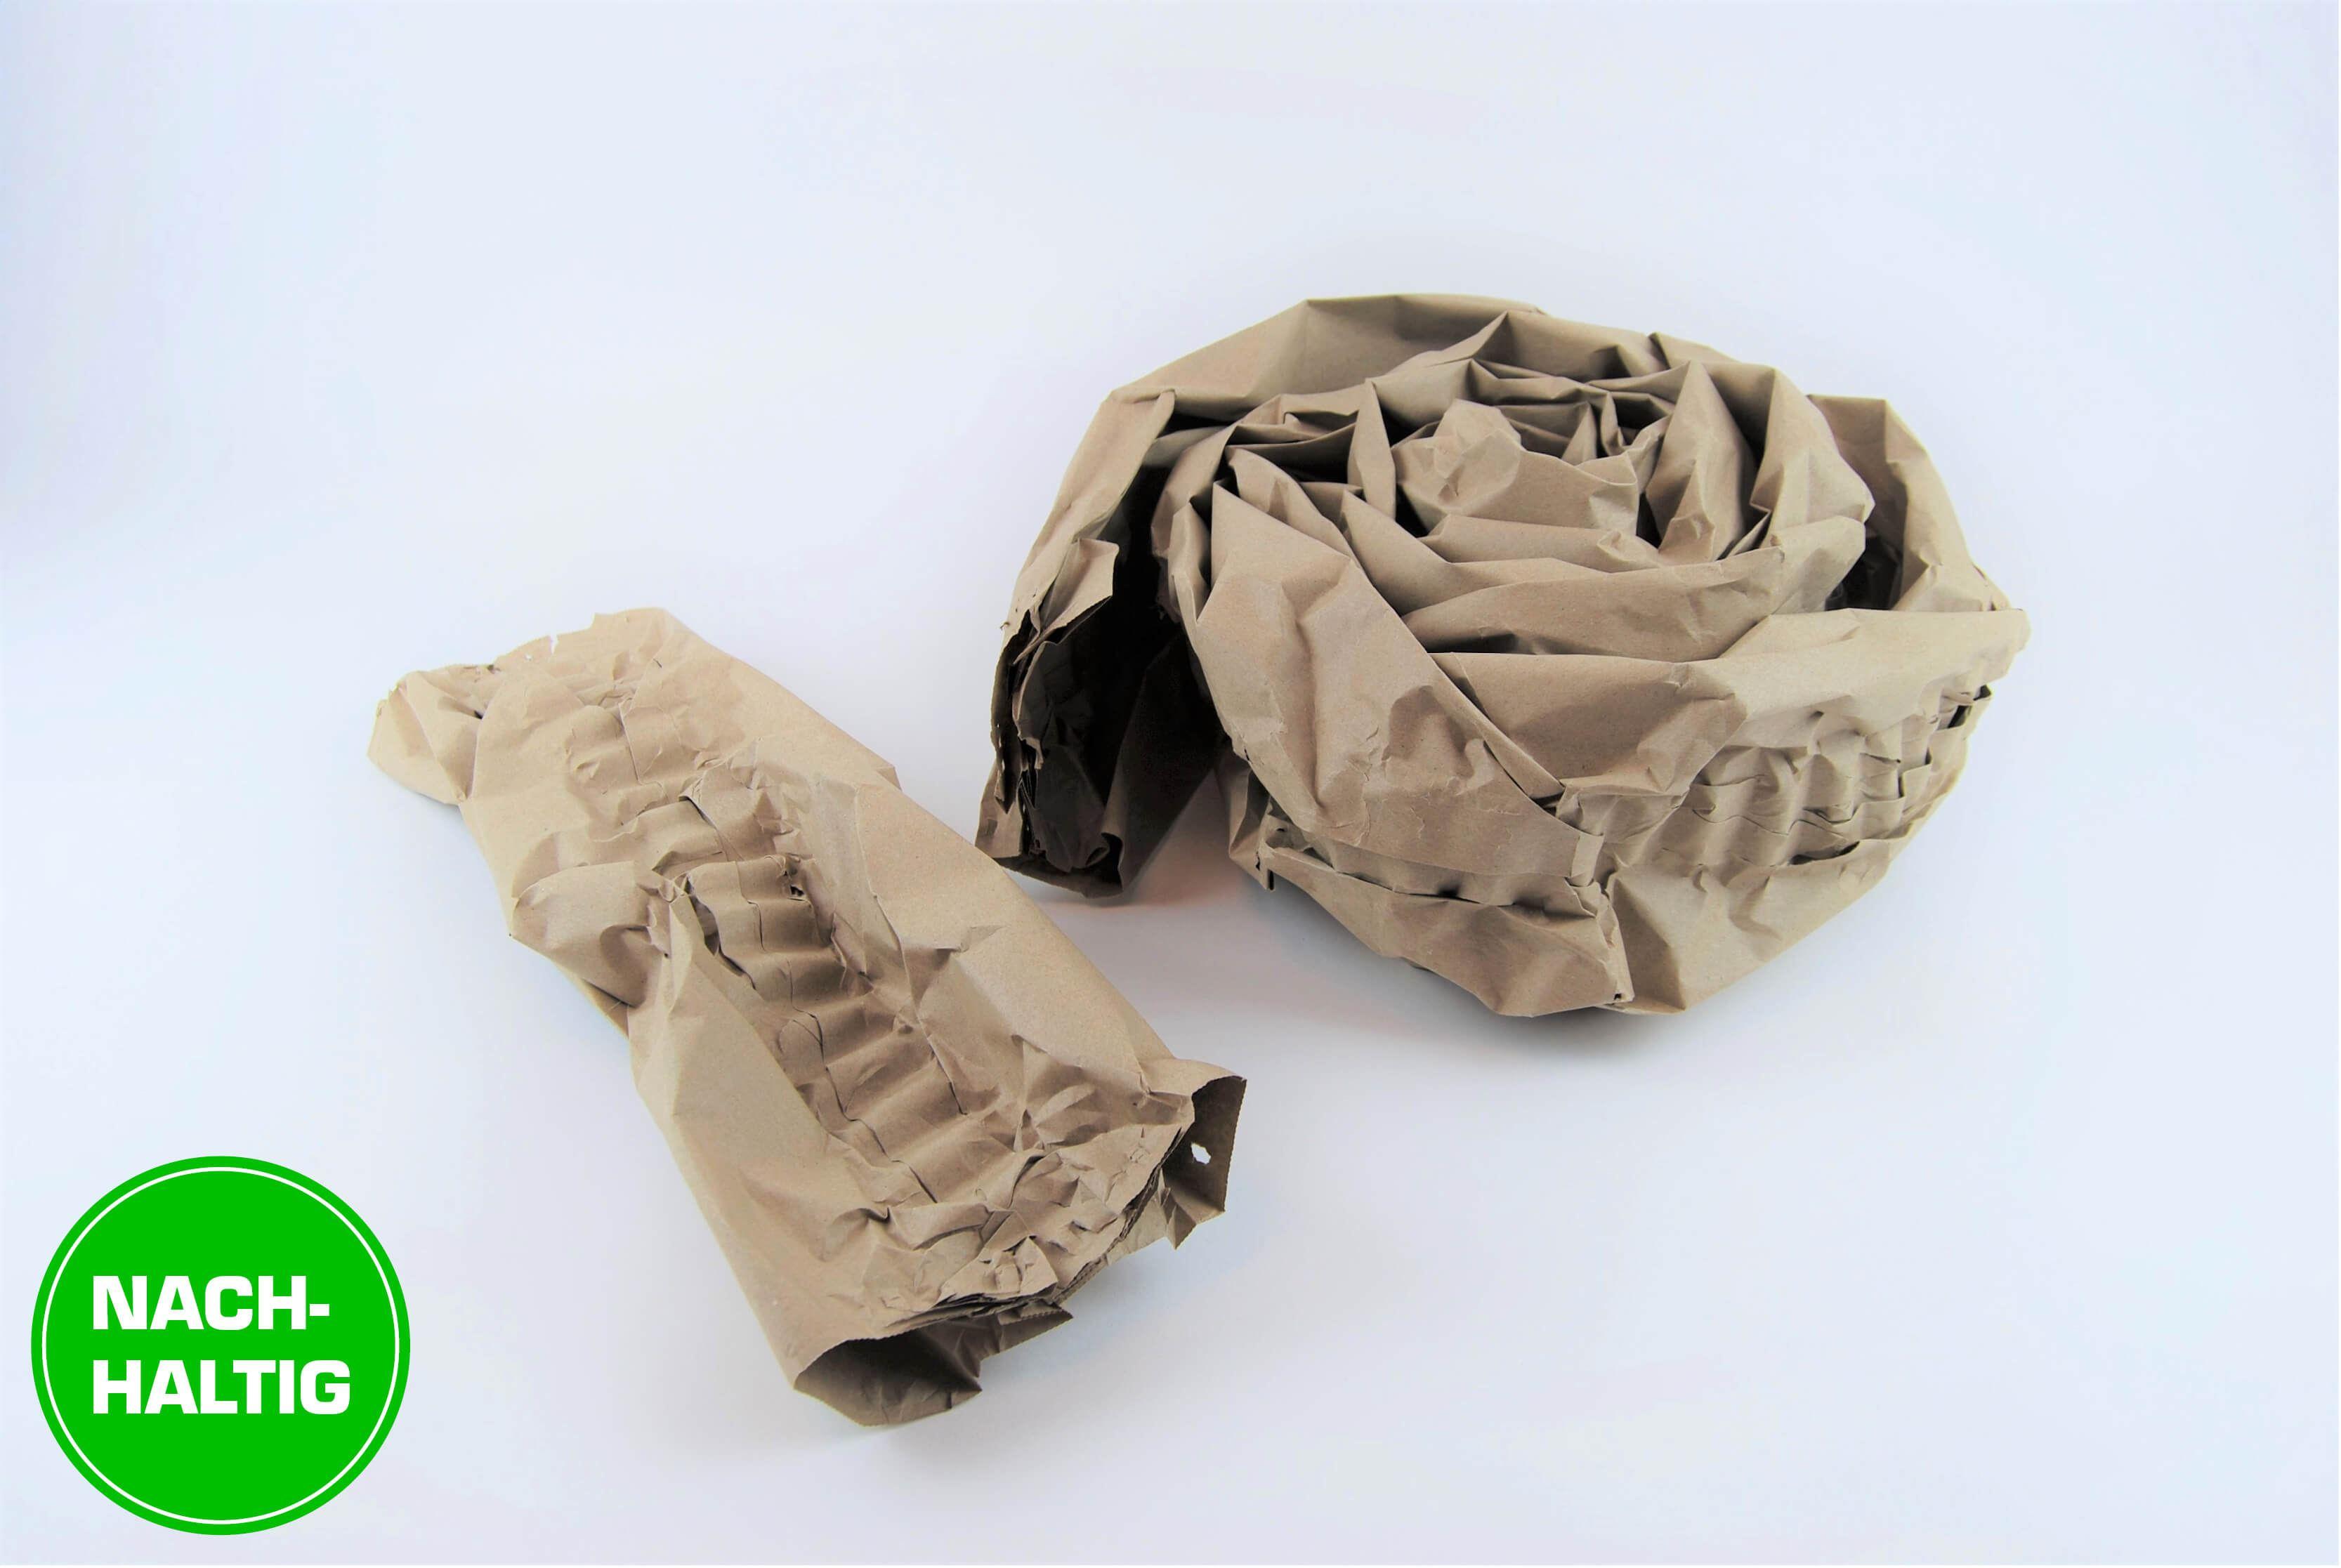 Nachhaltige PaperJet Papierpolster aus 100% Altpapier